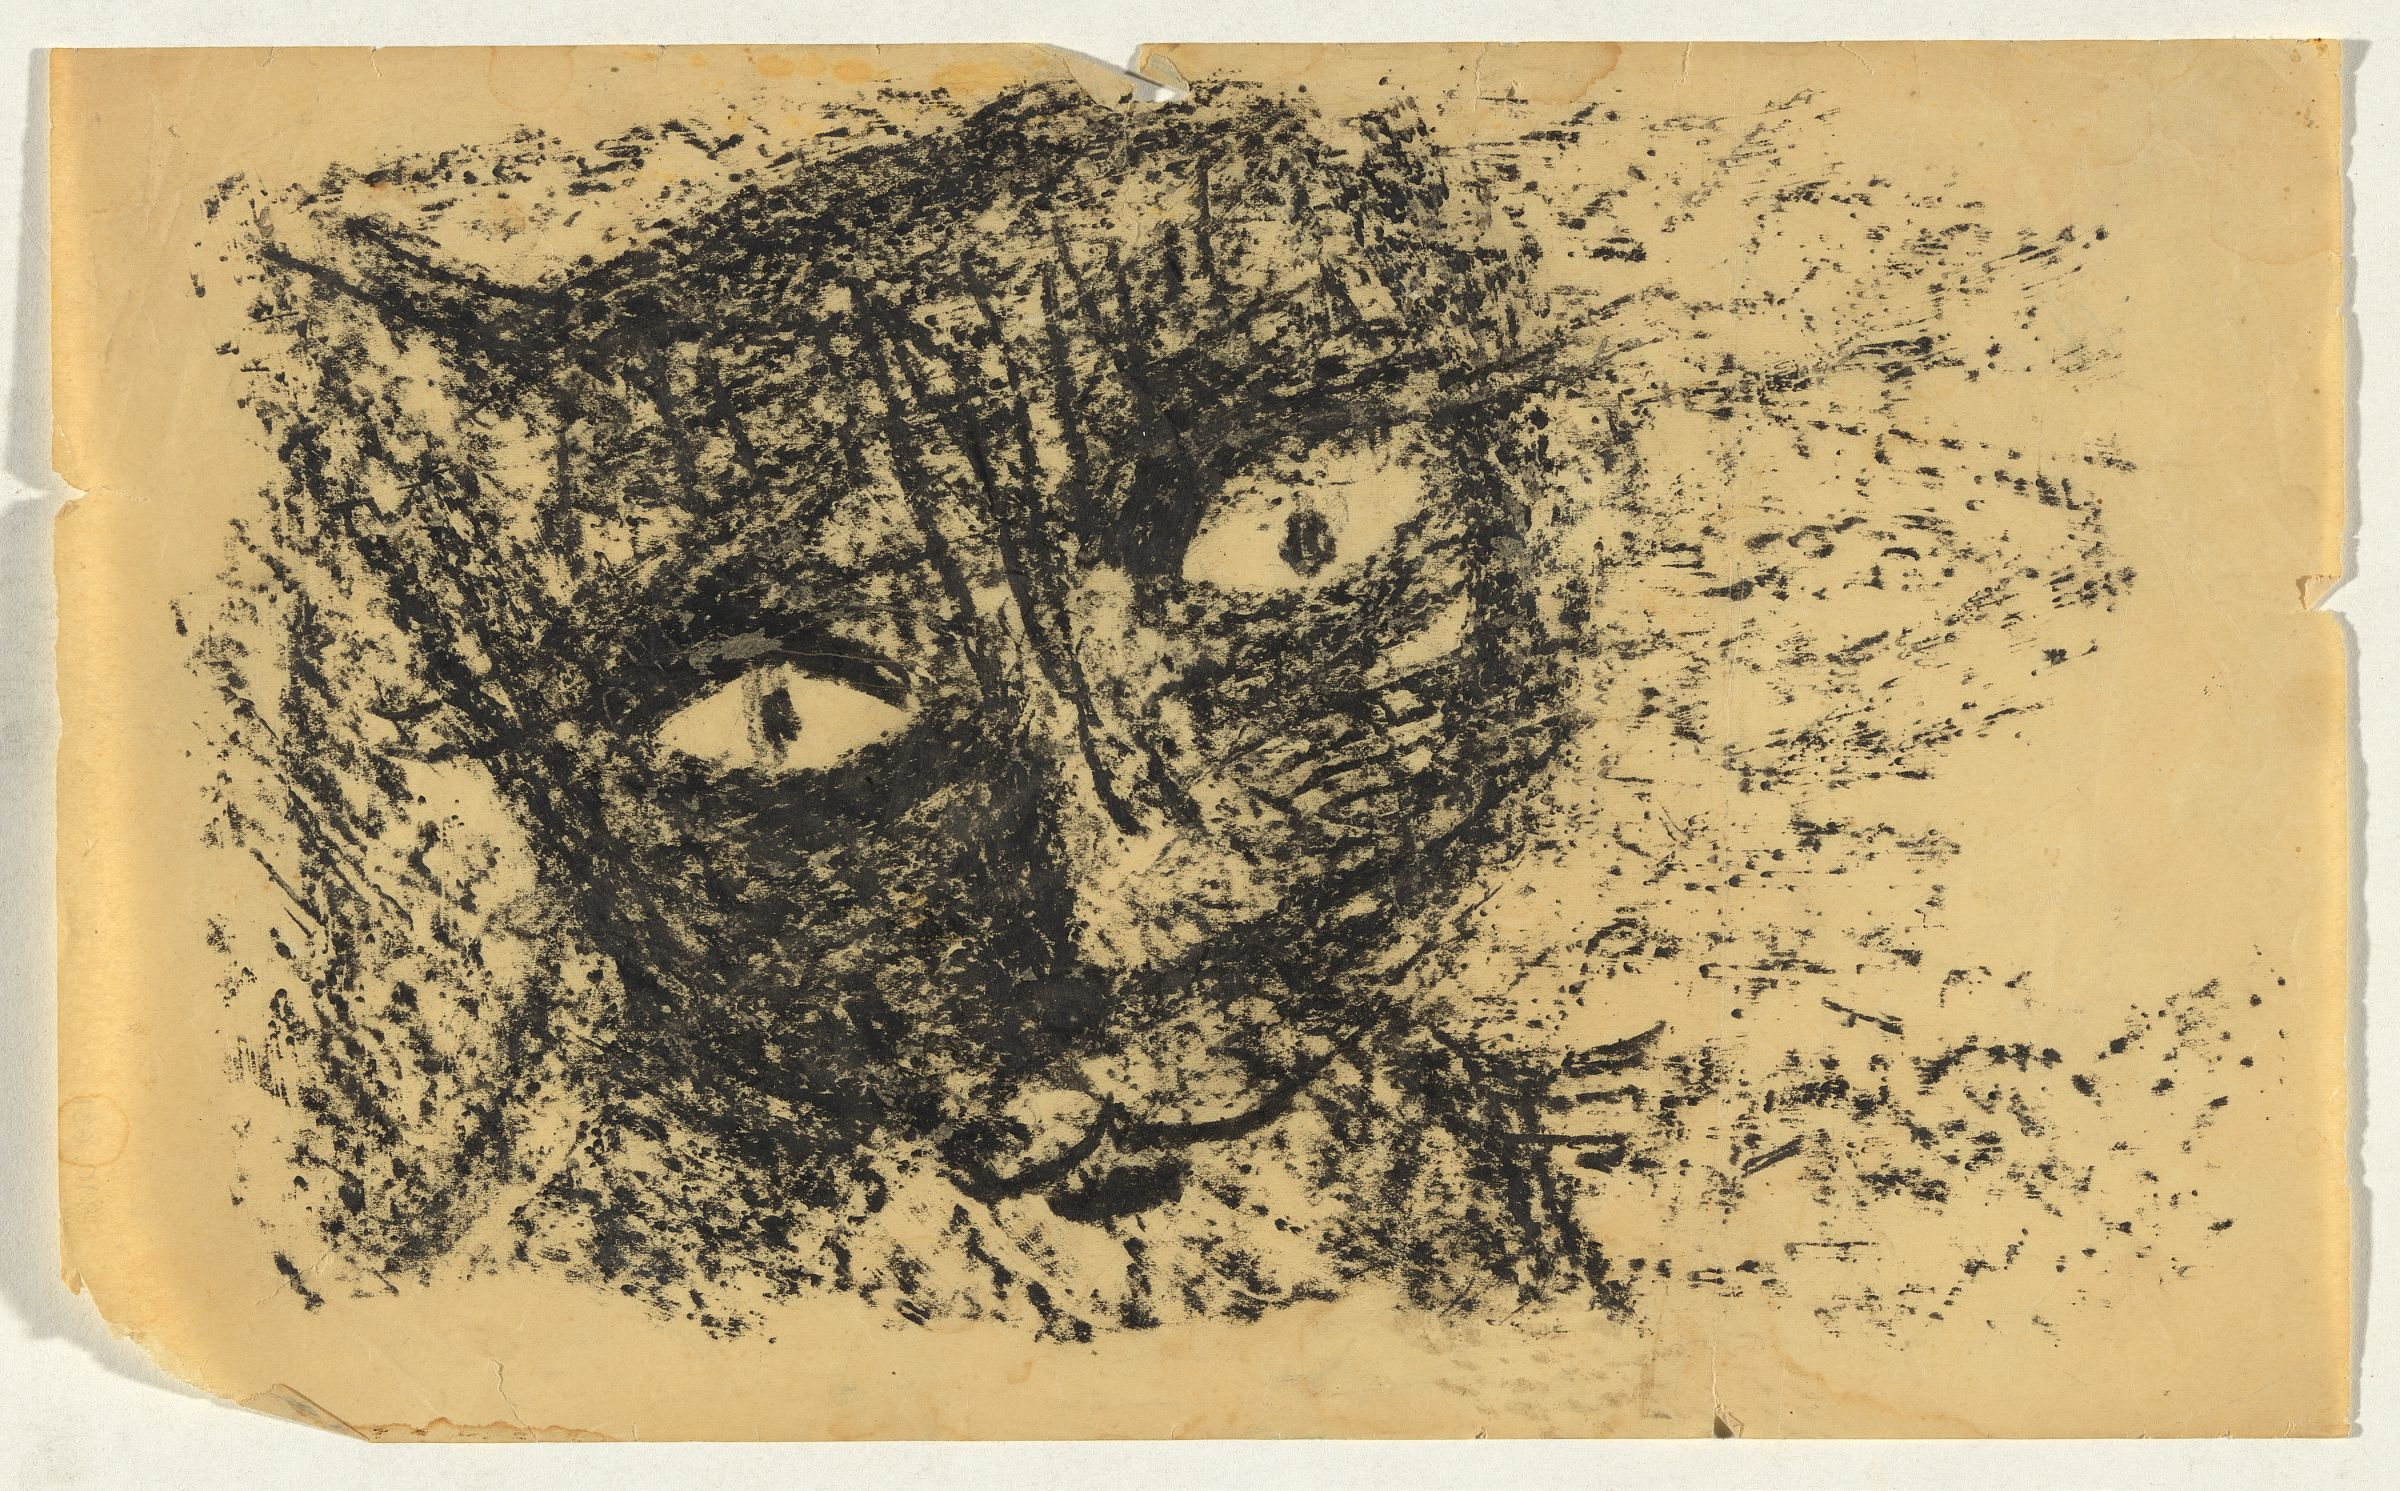 Cat's Face, Charles Blackman